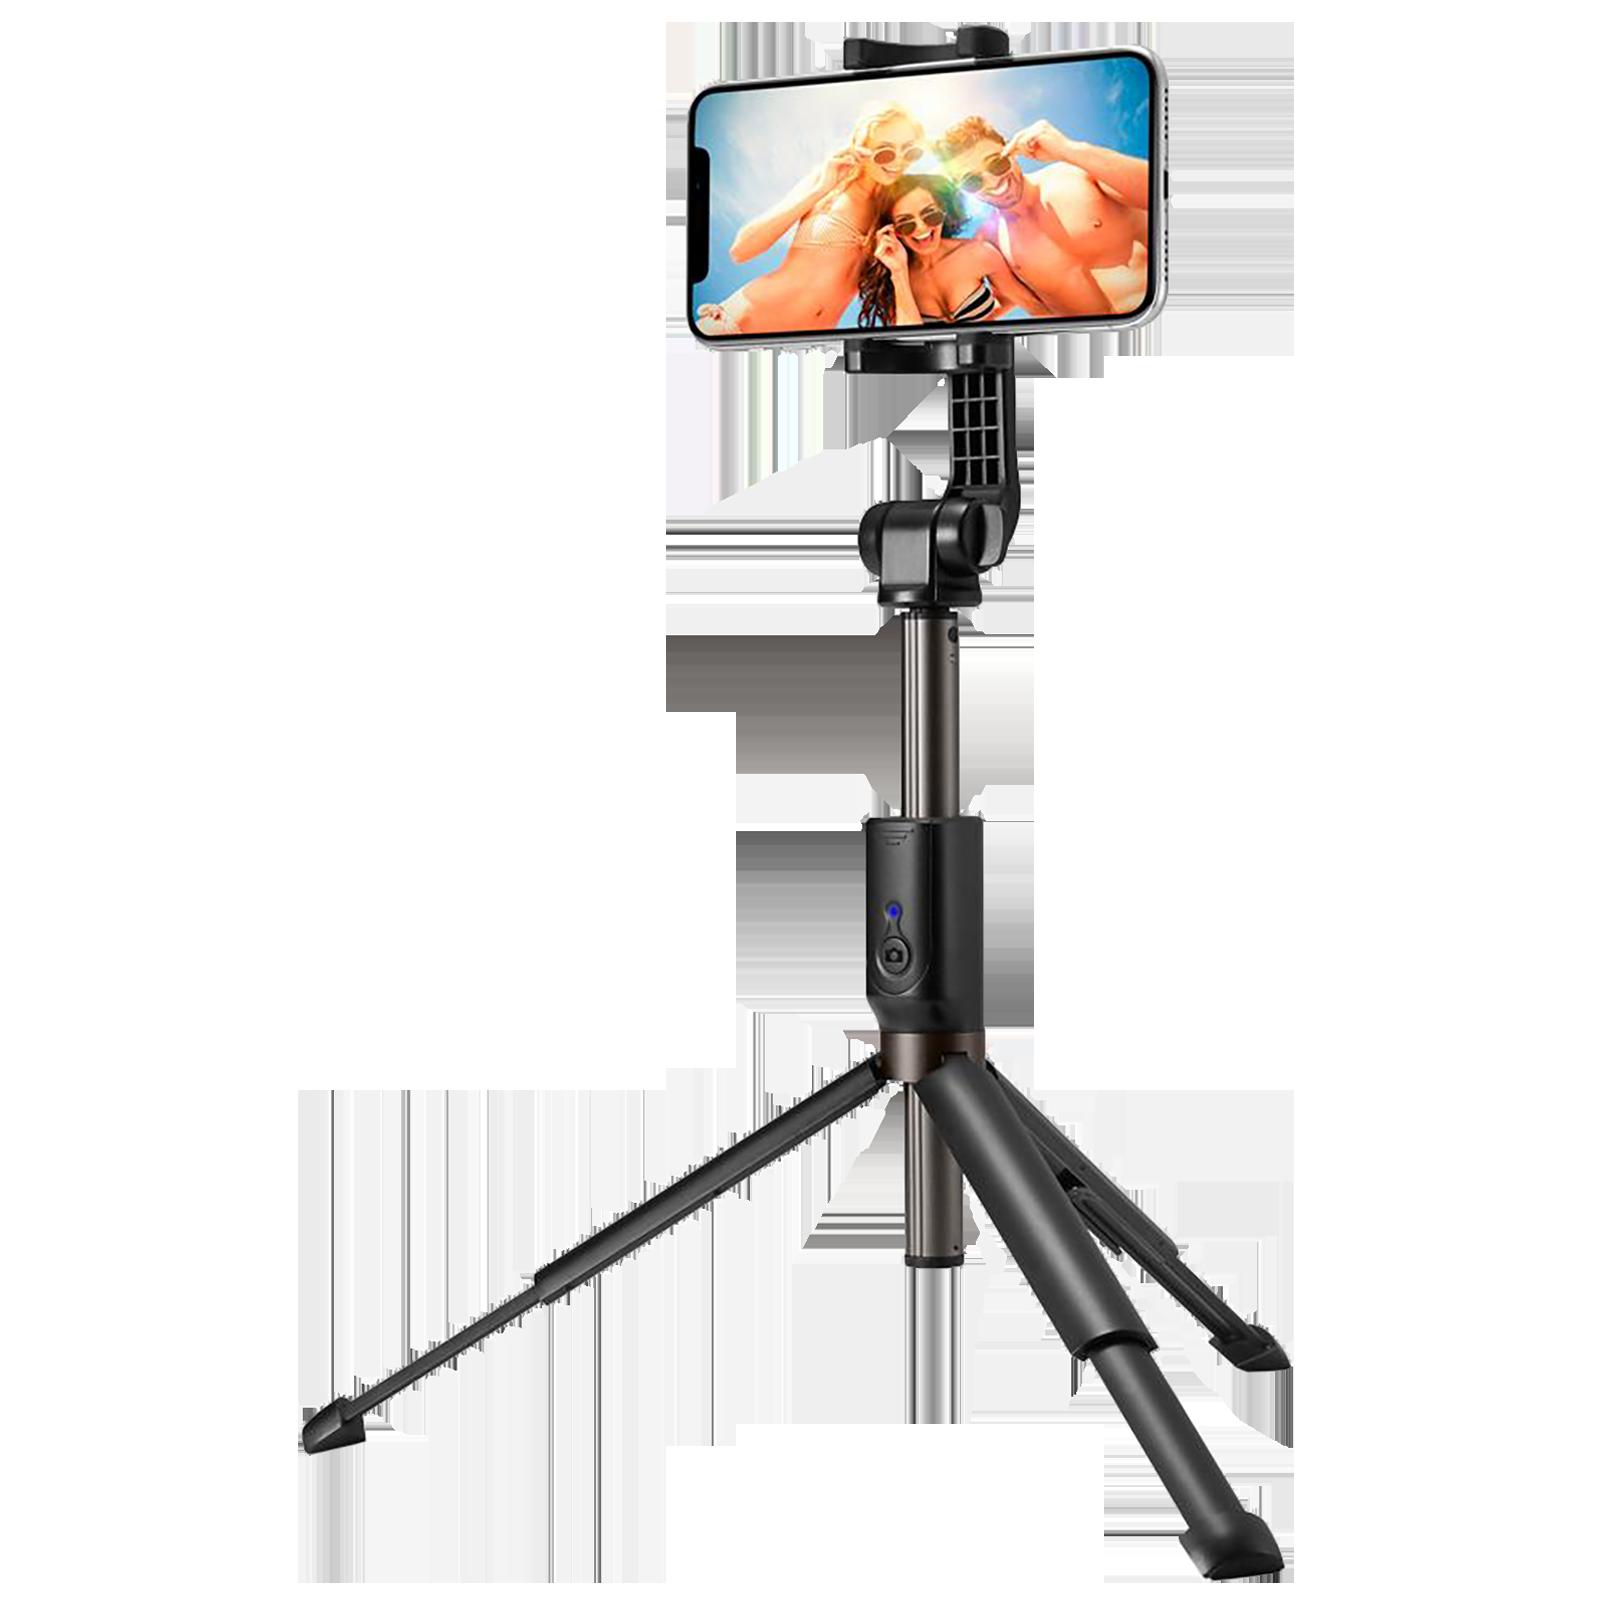 Spigen S540W Selfie Stick with Tripod (Bluetooth Wireless Technology, 000SS24111, Black)_1